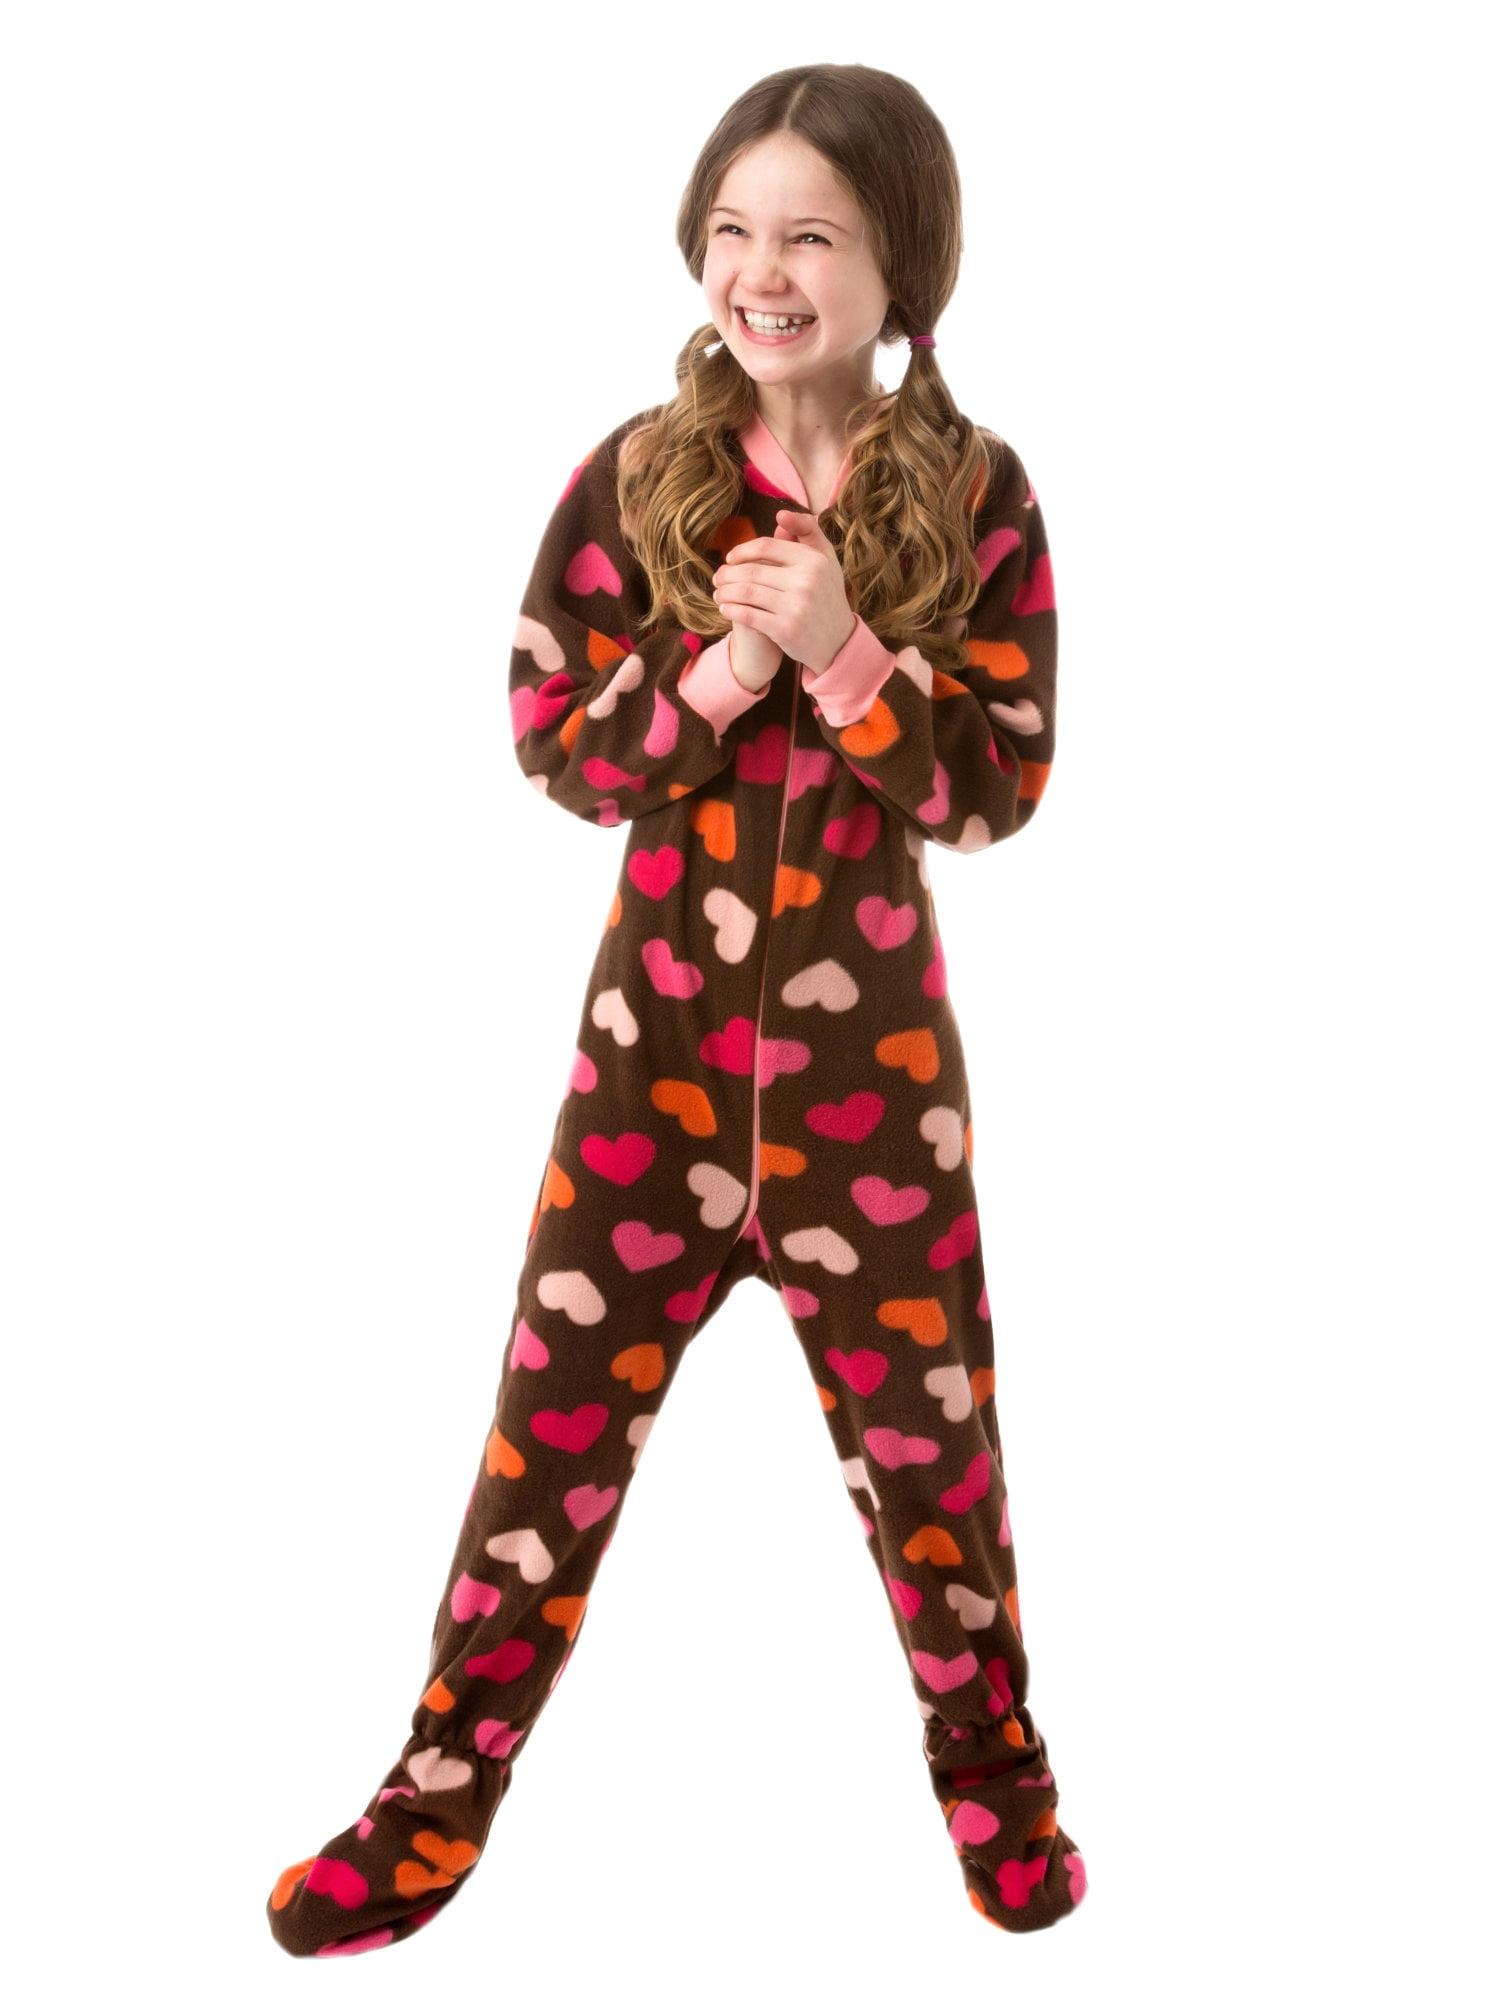 Big Feet Pjs Kids Footed One Piece Sleeper Chocolate Brown with Hearts Footed Pajamas